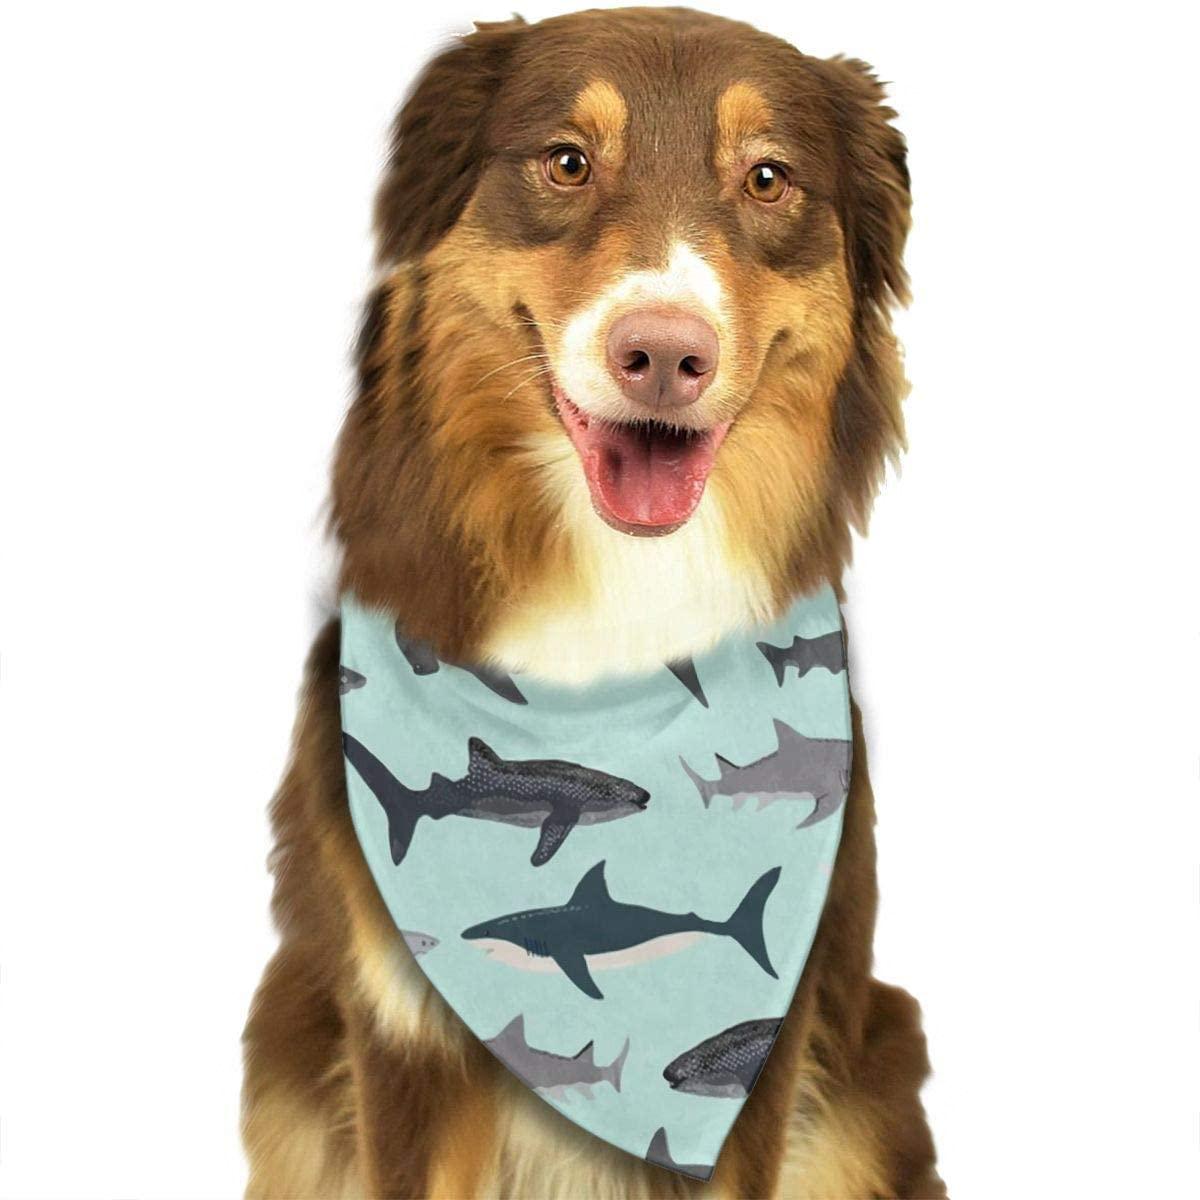 CHAN03 Dogs Bandana Collars Shark Pets Triangle Neckerchief Puppy Bibs Scarfs Cats Scarfs Towel